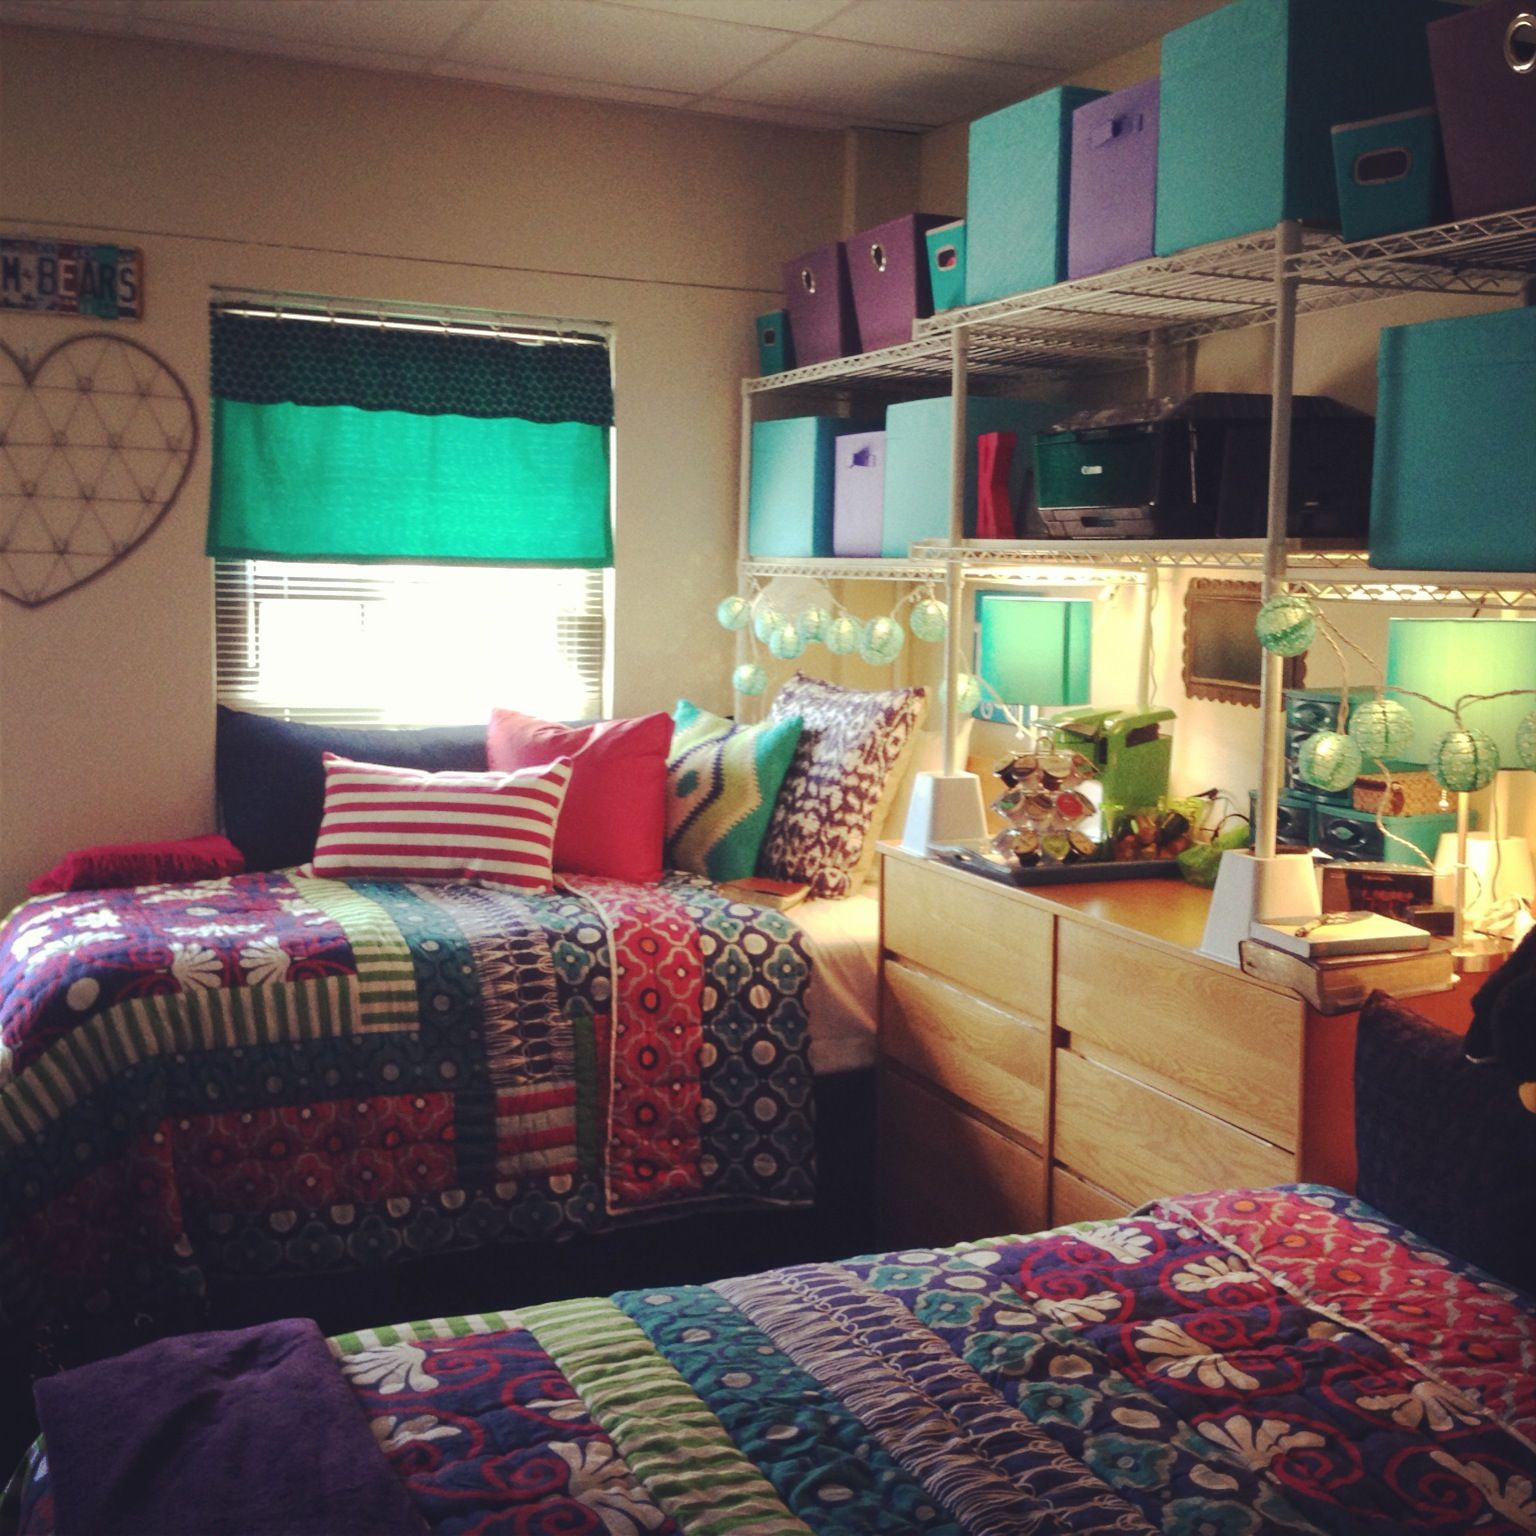 Bedrooms pinterest for Deko inneneinrichtung